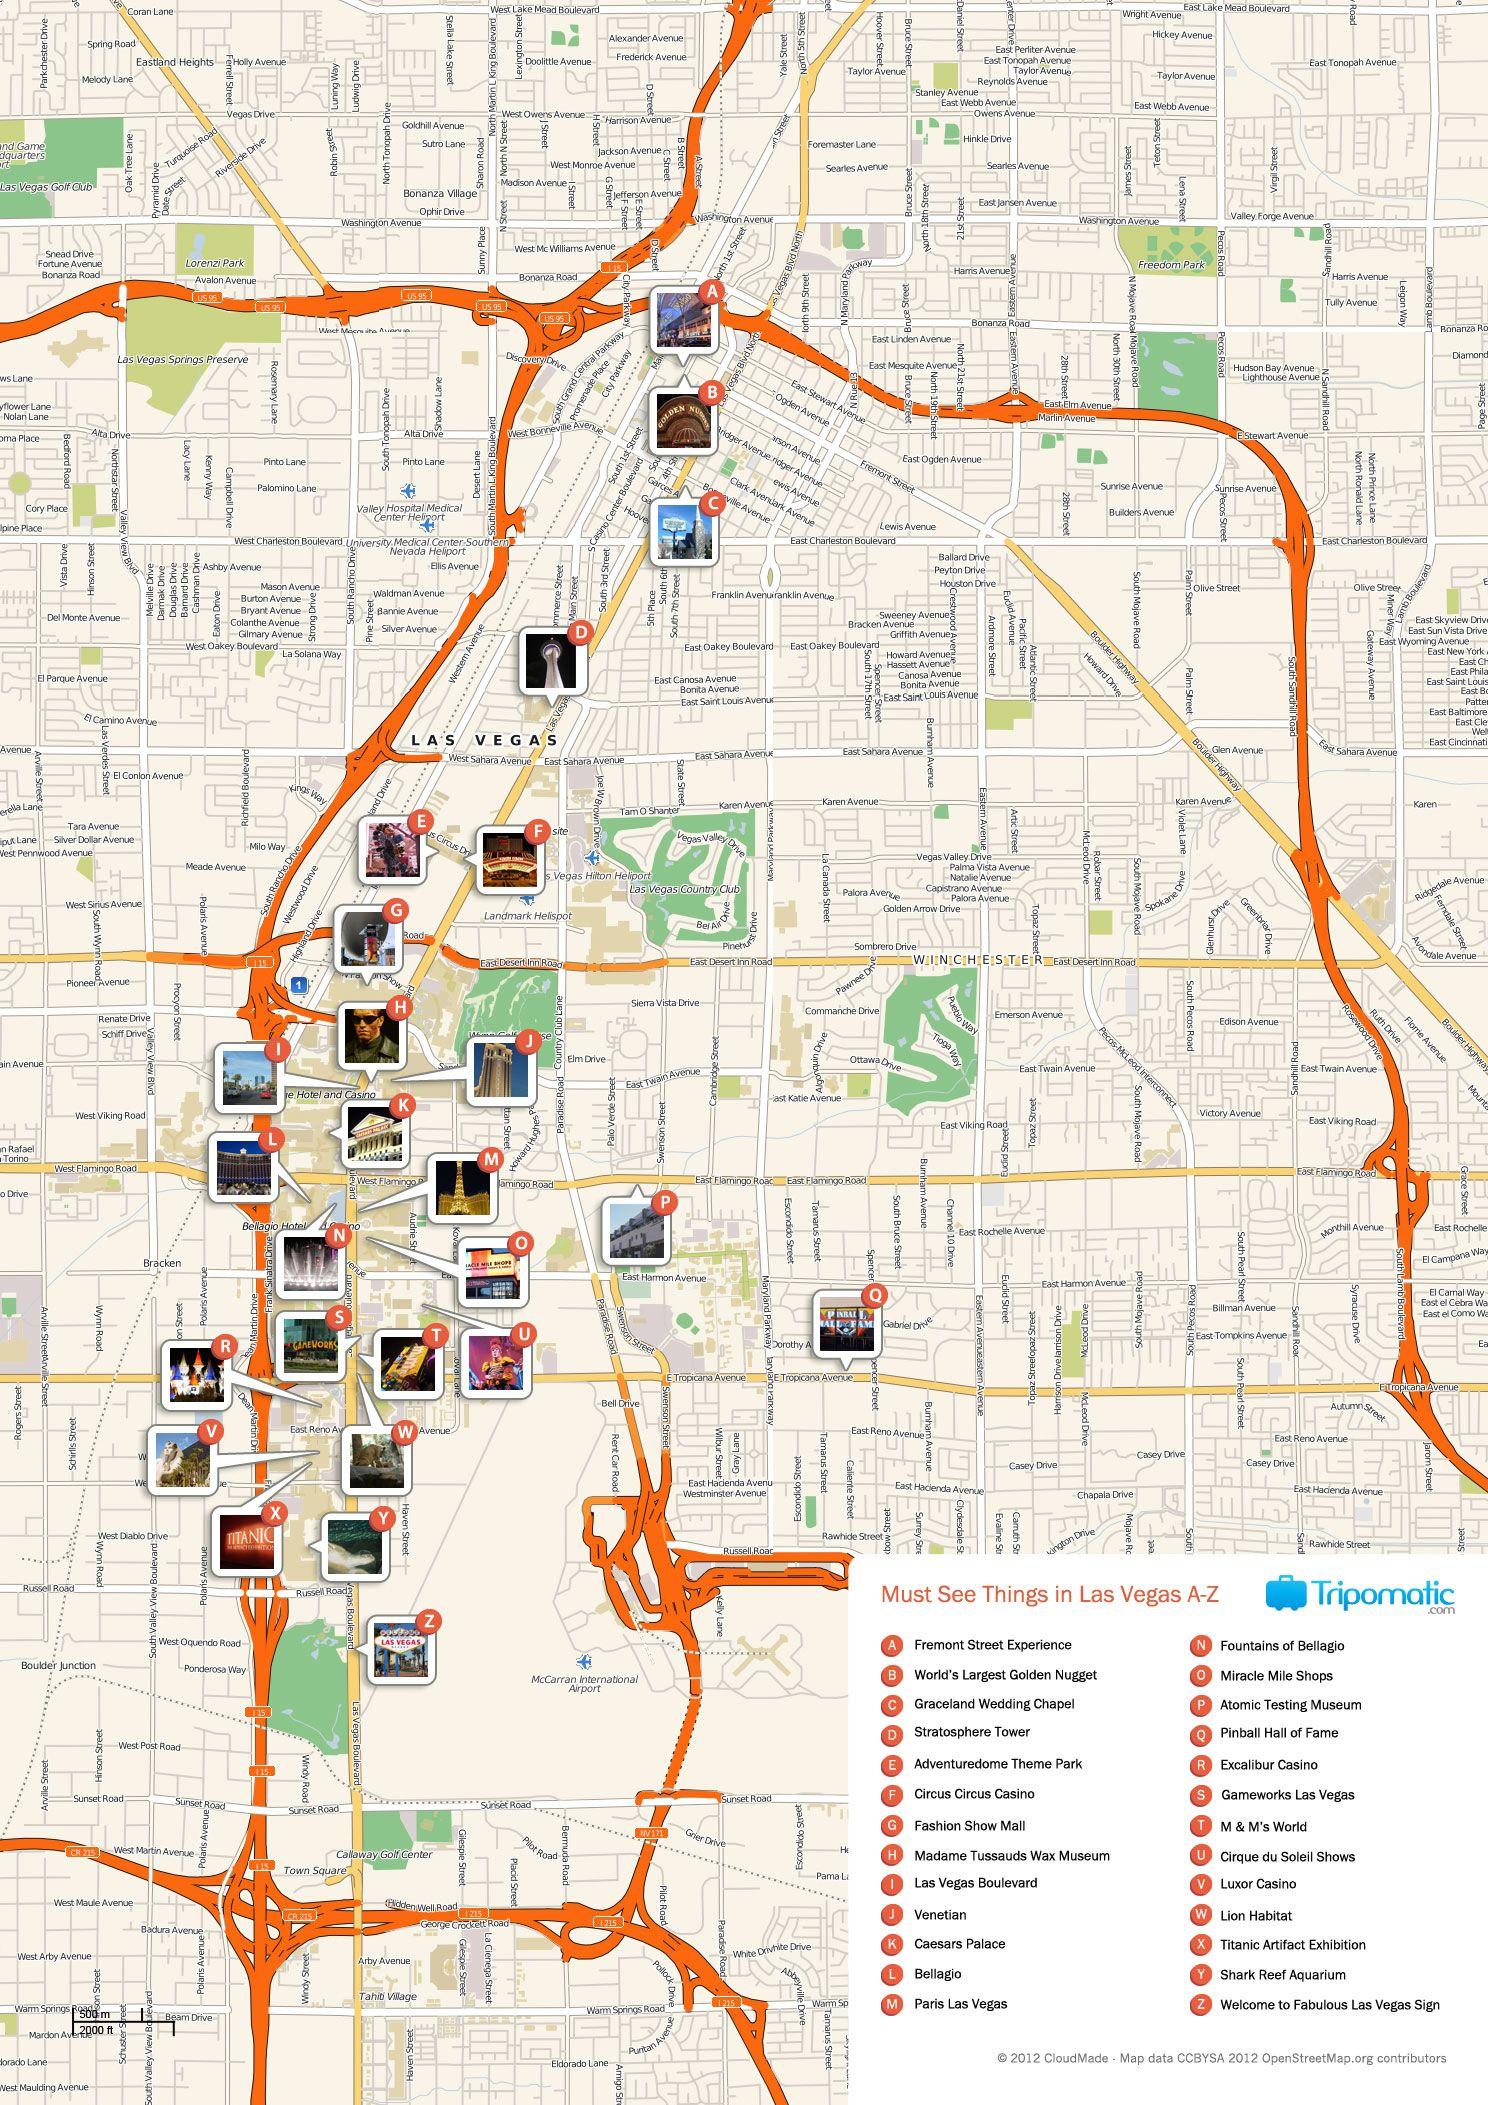 Map Of Las Vegas Attractions Tripomatic Las Vegas Map